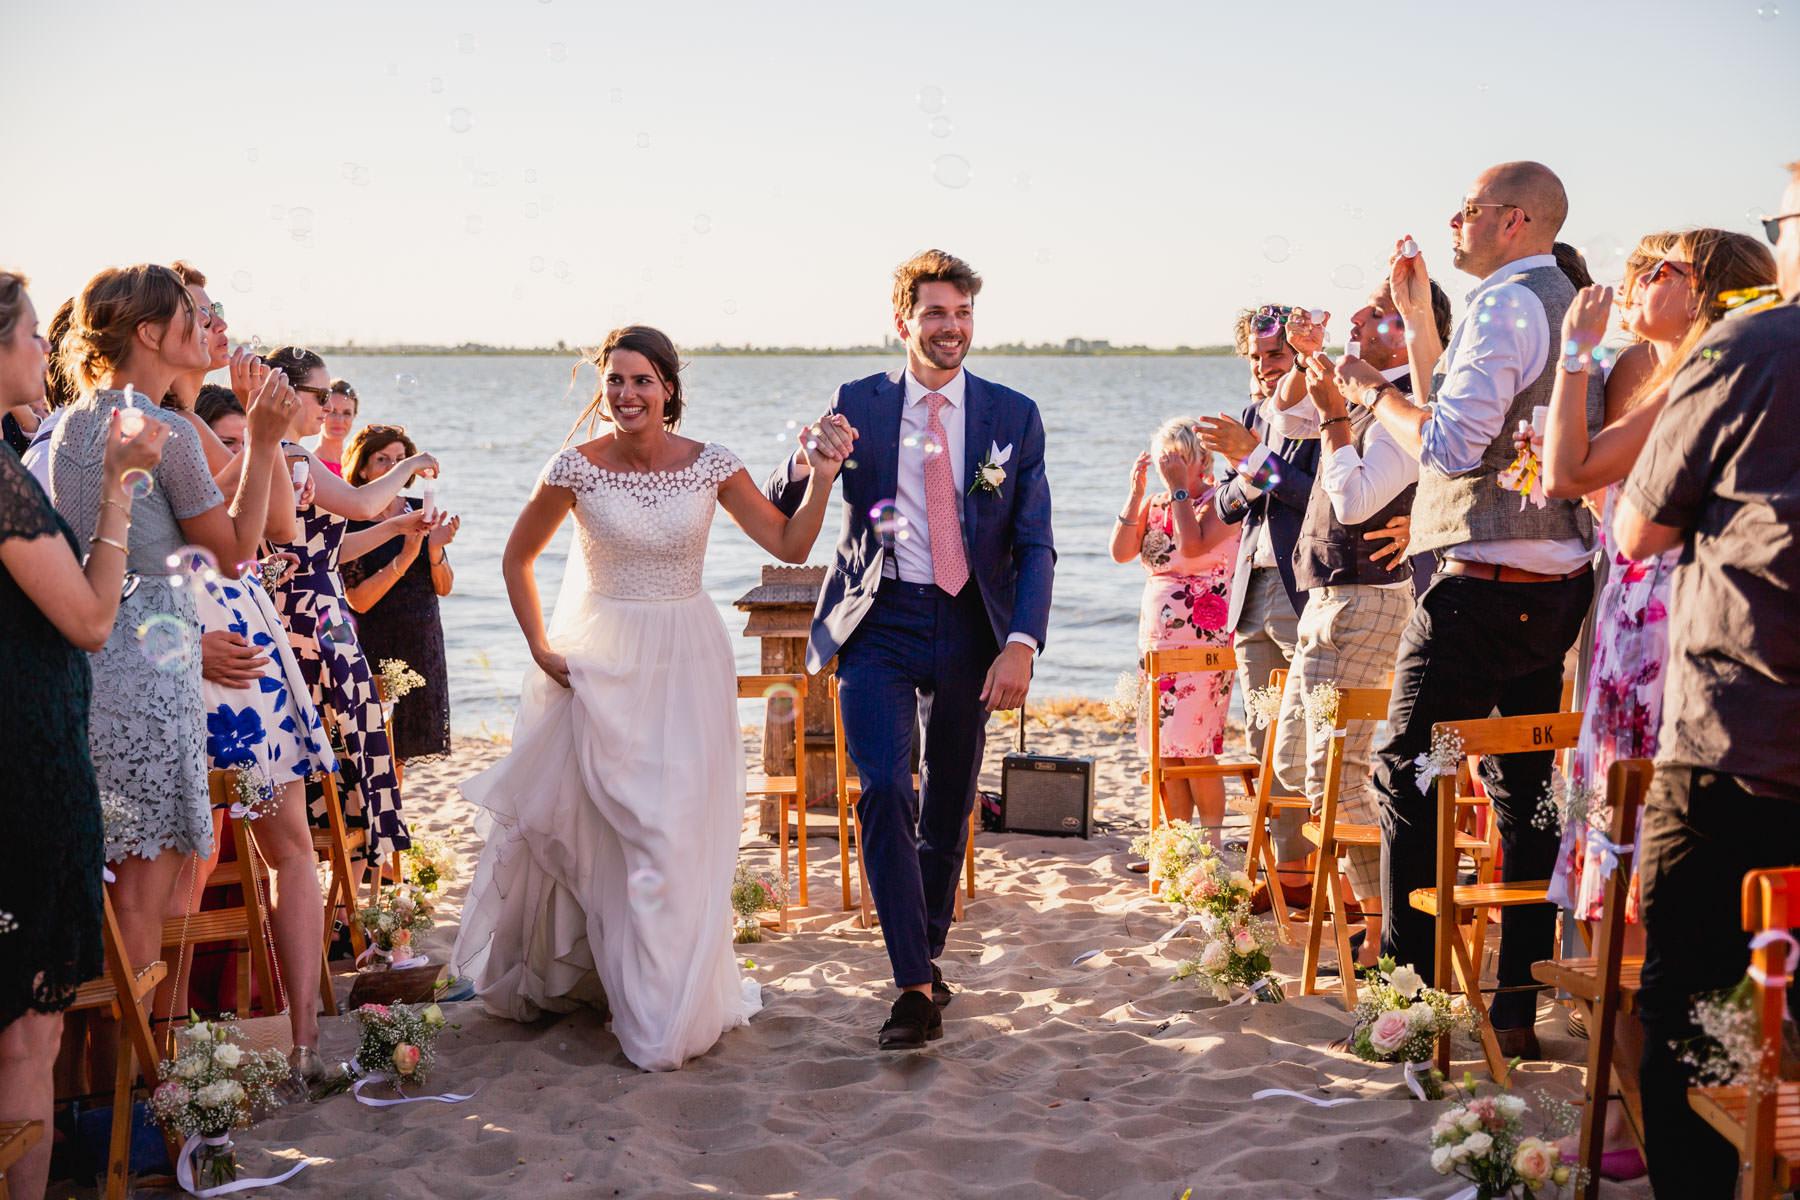 Trouwen op het strand   Trouwfoto's zomer   Strandbruiloft   Beachwedding